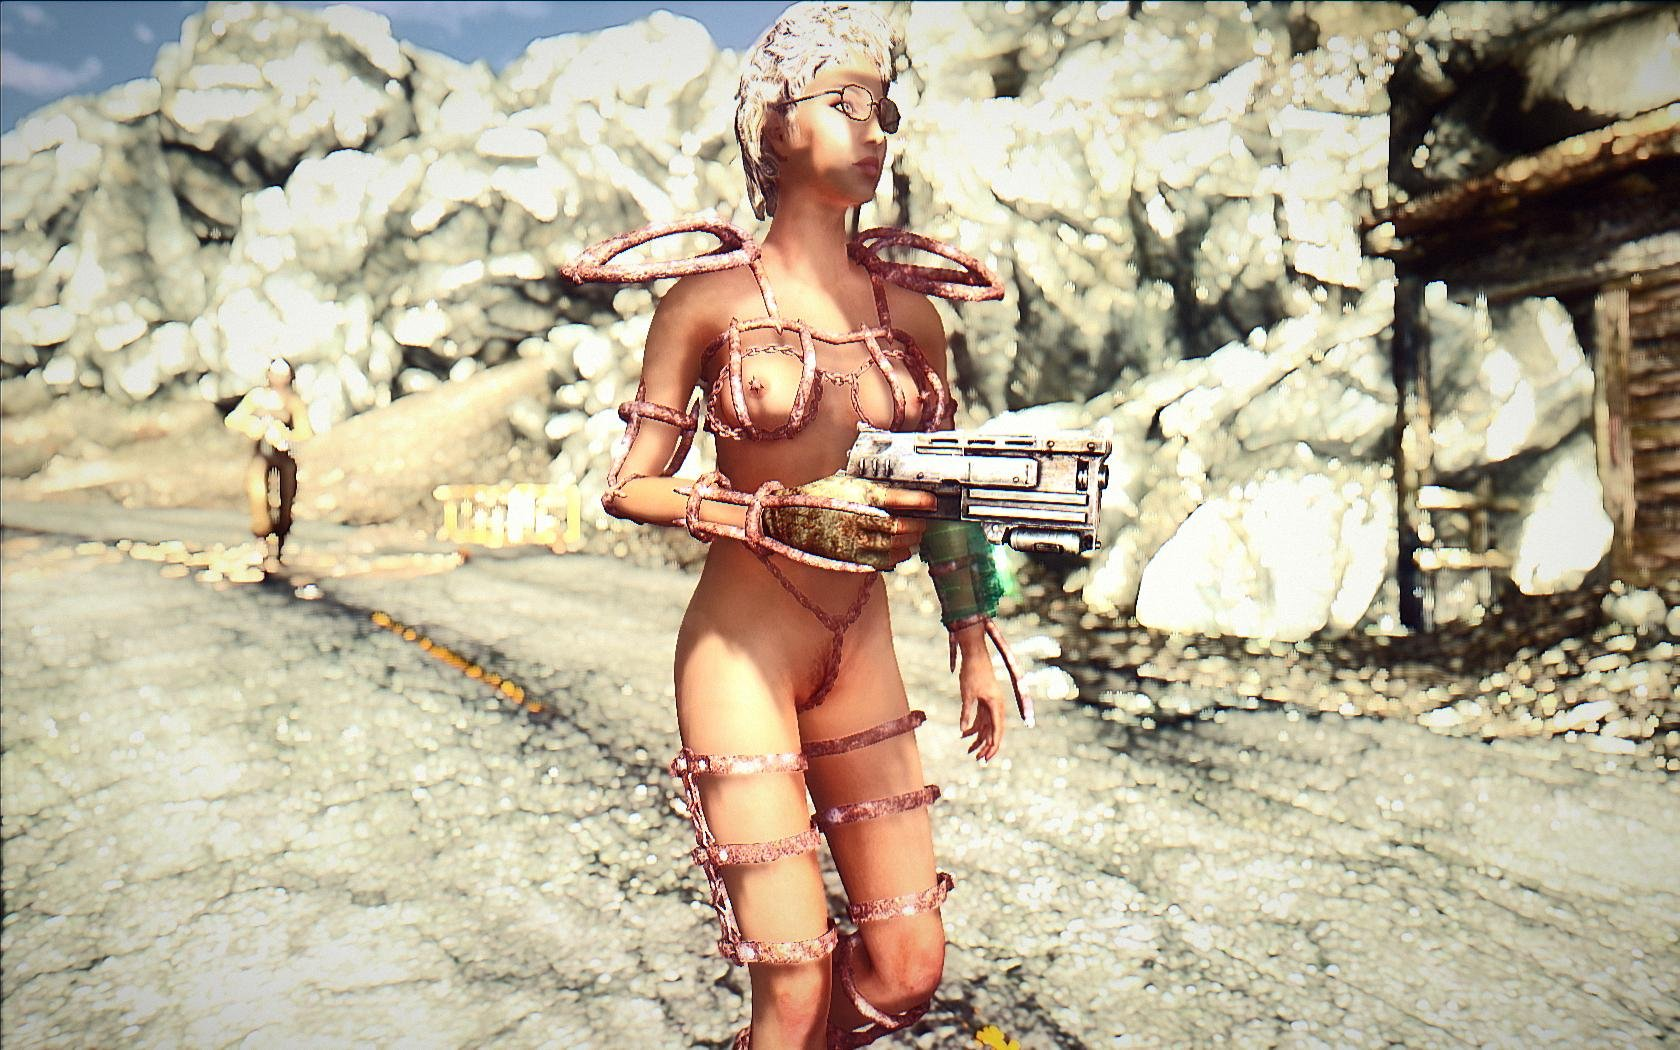 Fallout3 2018-10-01 22-20-10-13.jpg